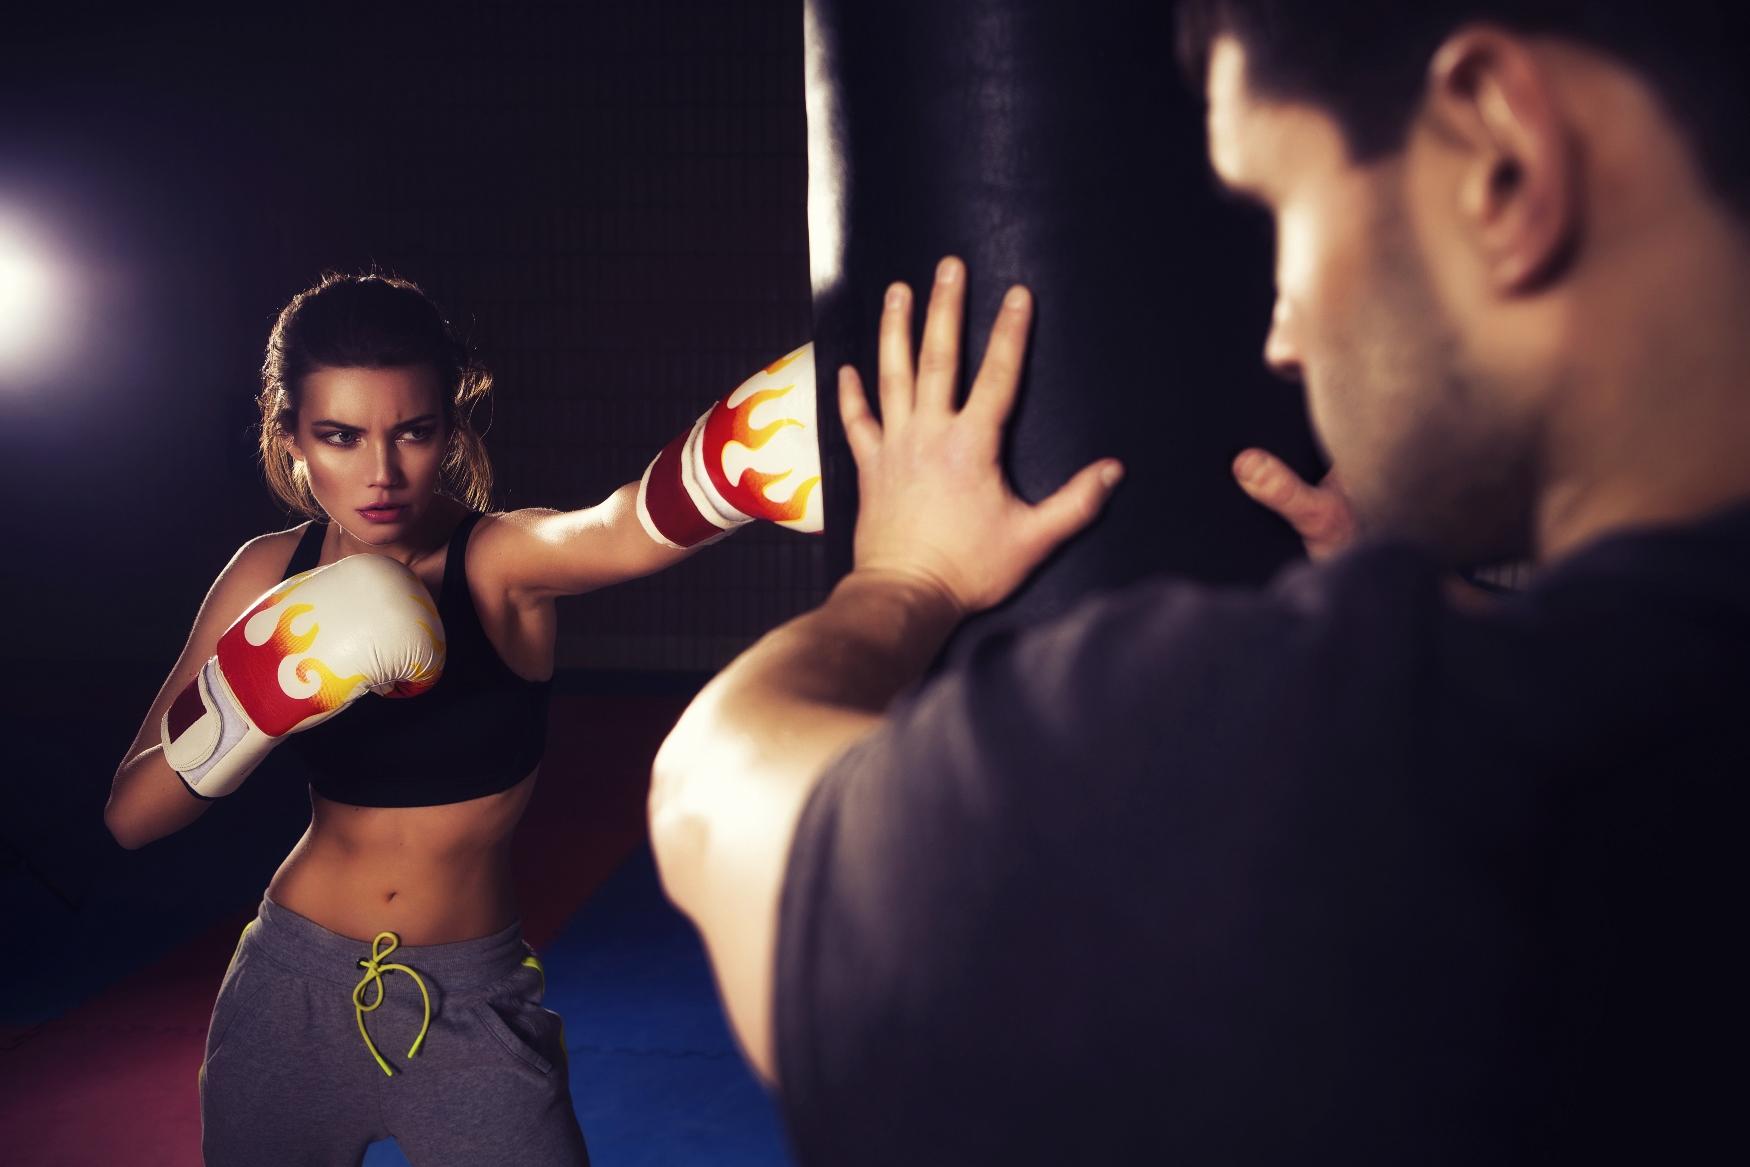 фотогалерея женского бокса